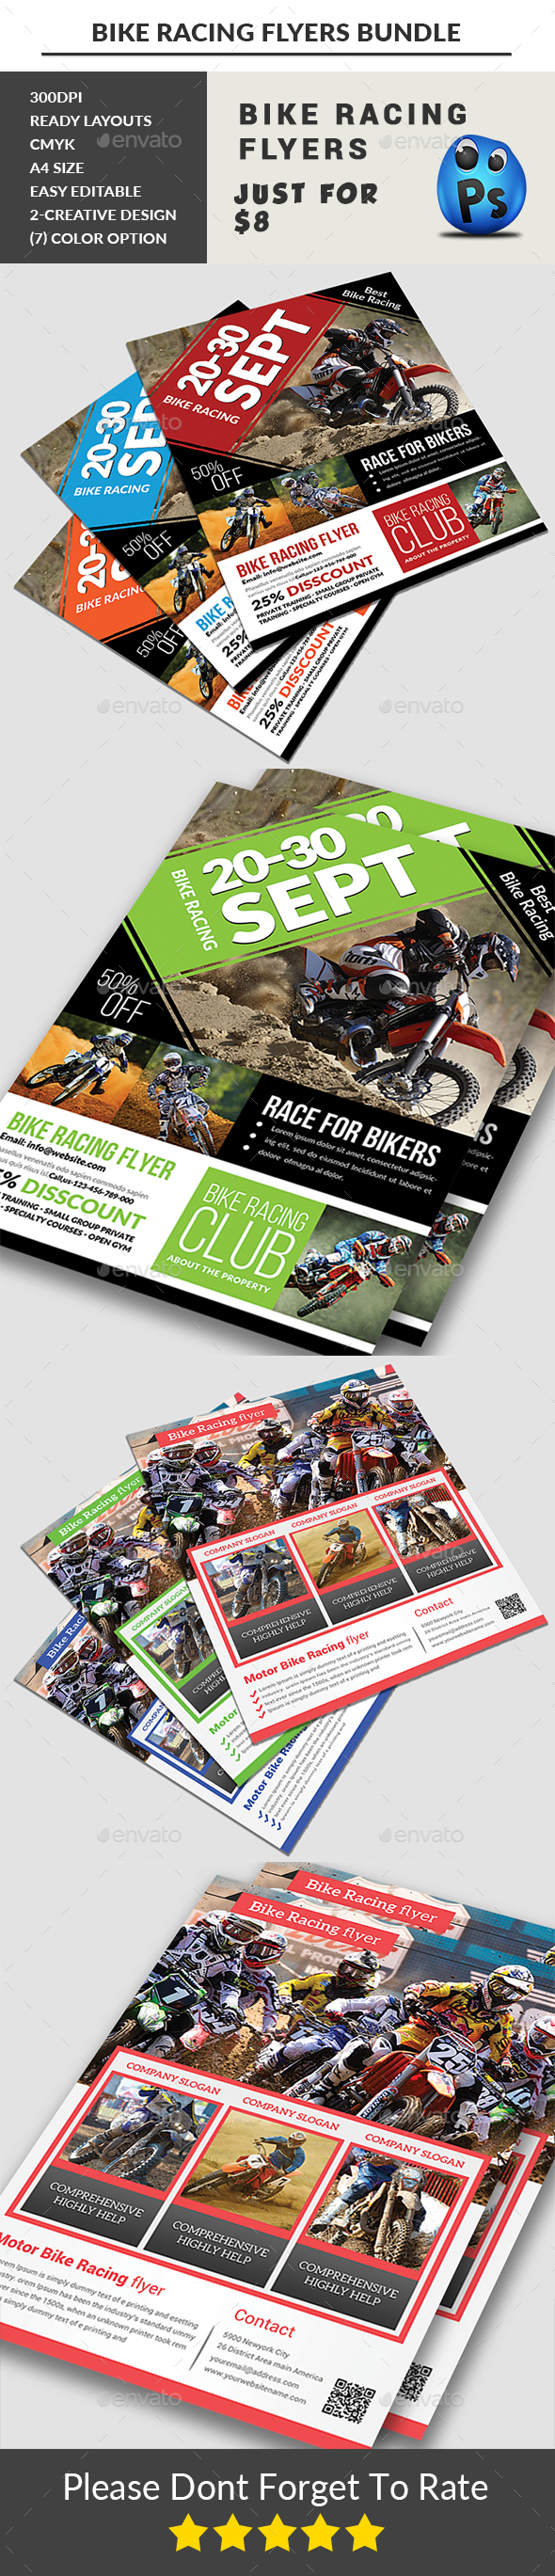 Bike Racing Flyers Bundle - Sports Events